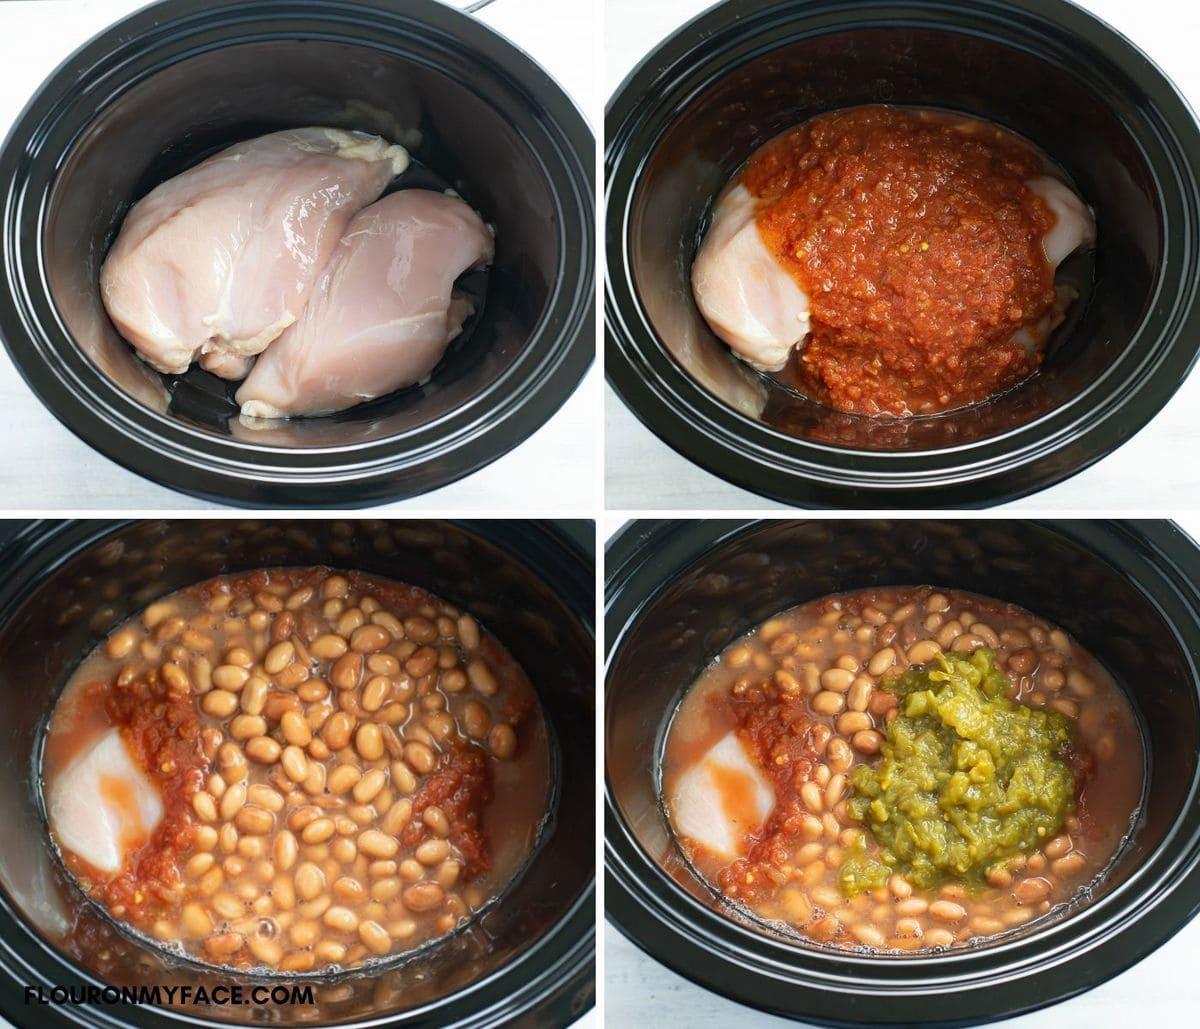 4 Step image adding chicken burritos ingredients to the crock pot.